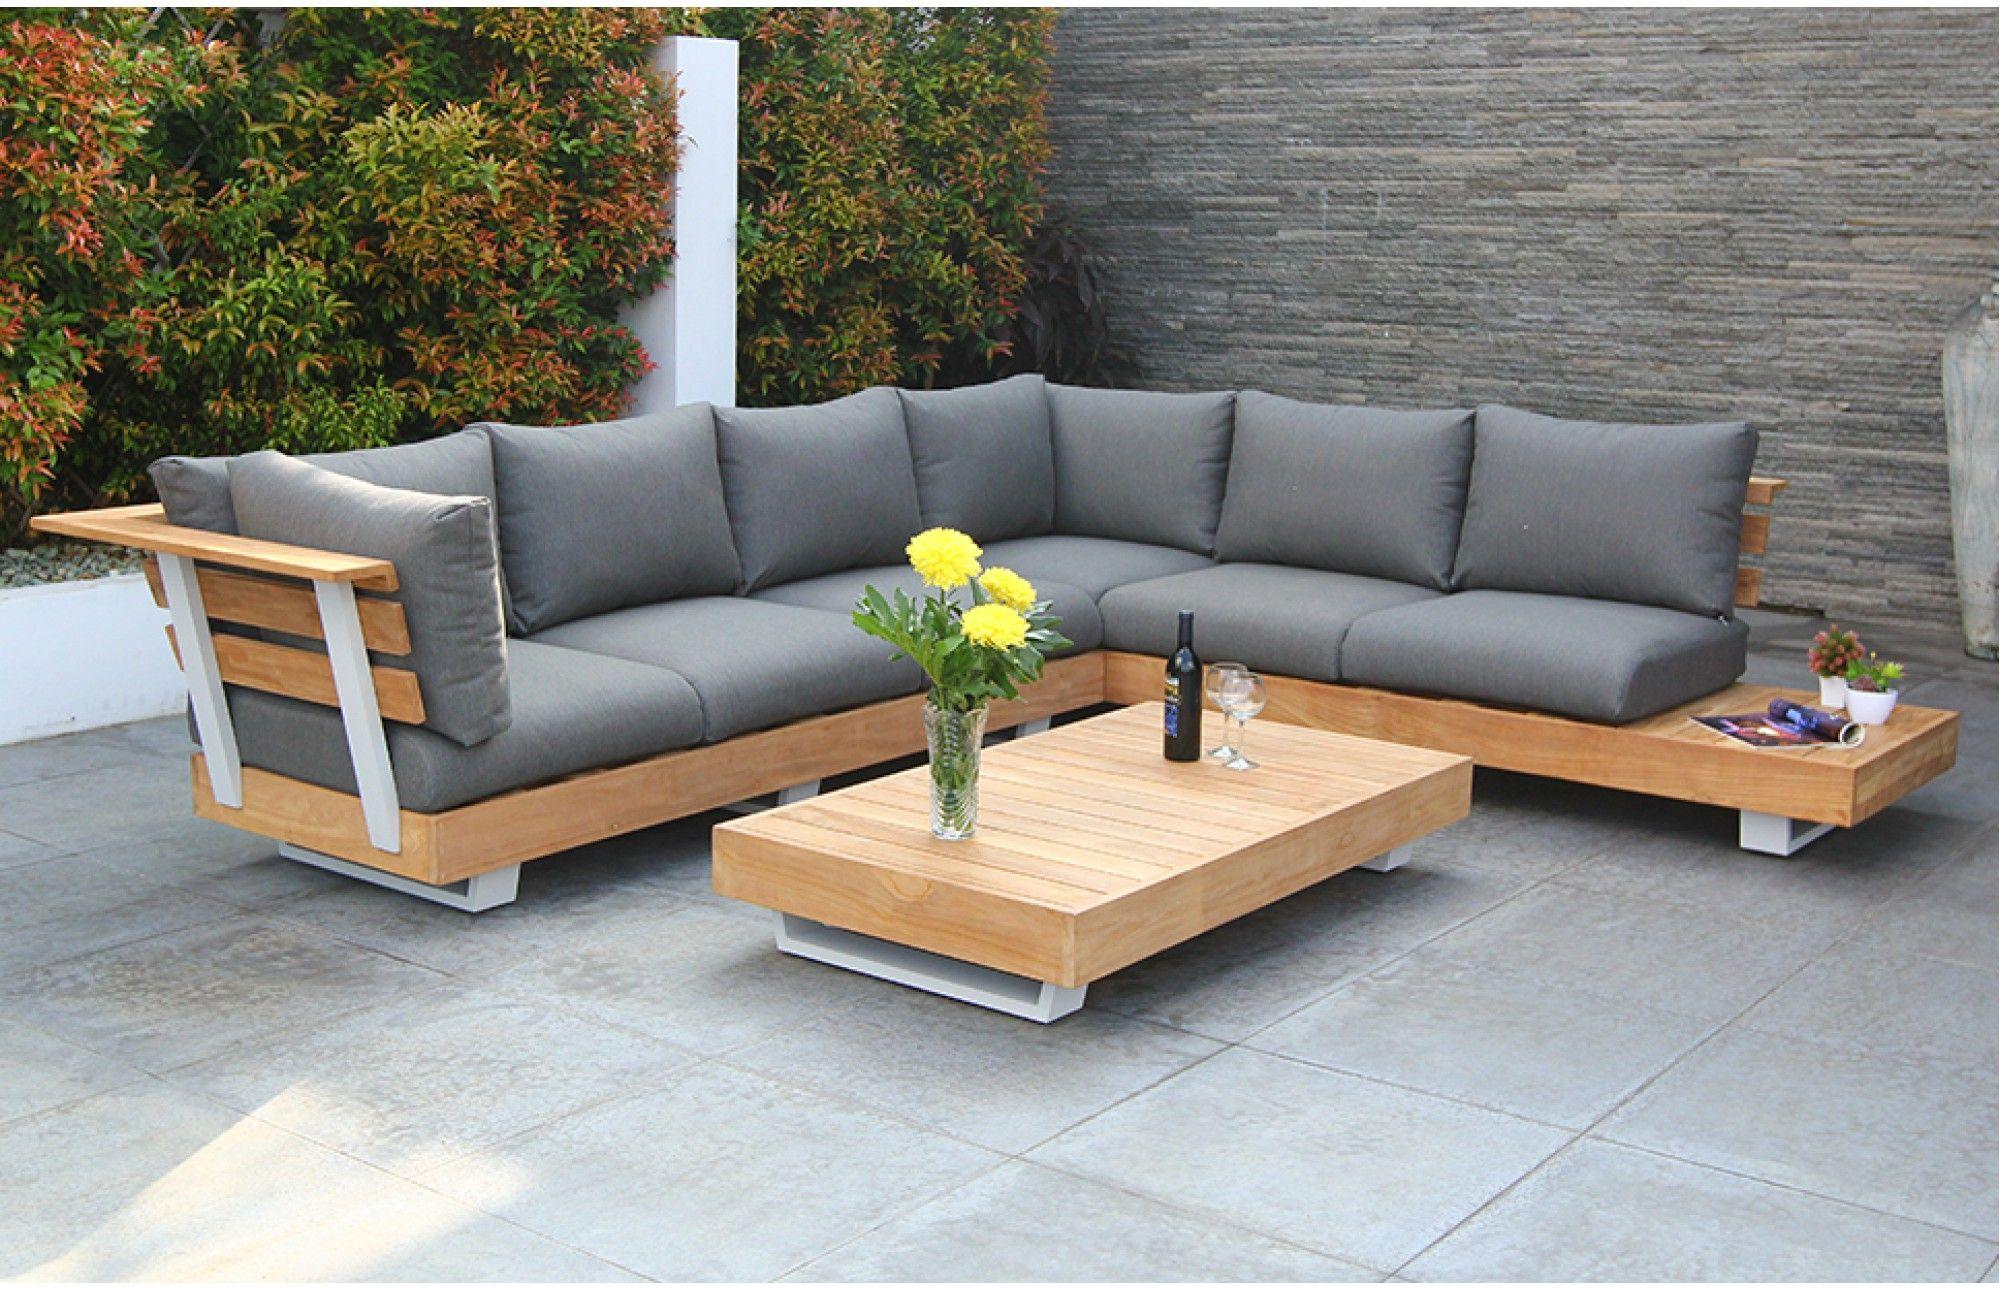 Seville - Designer Garden Lounge Set | Gardens and Garden ideas